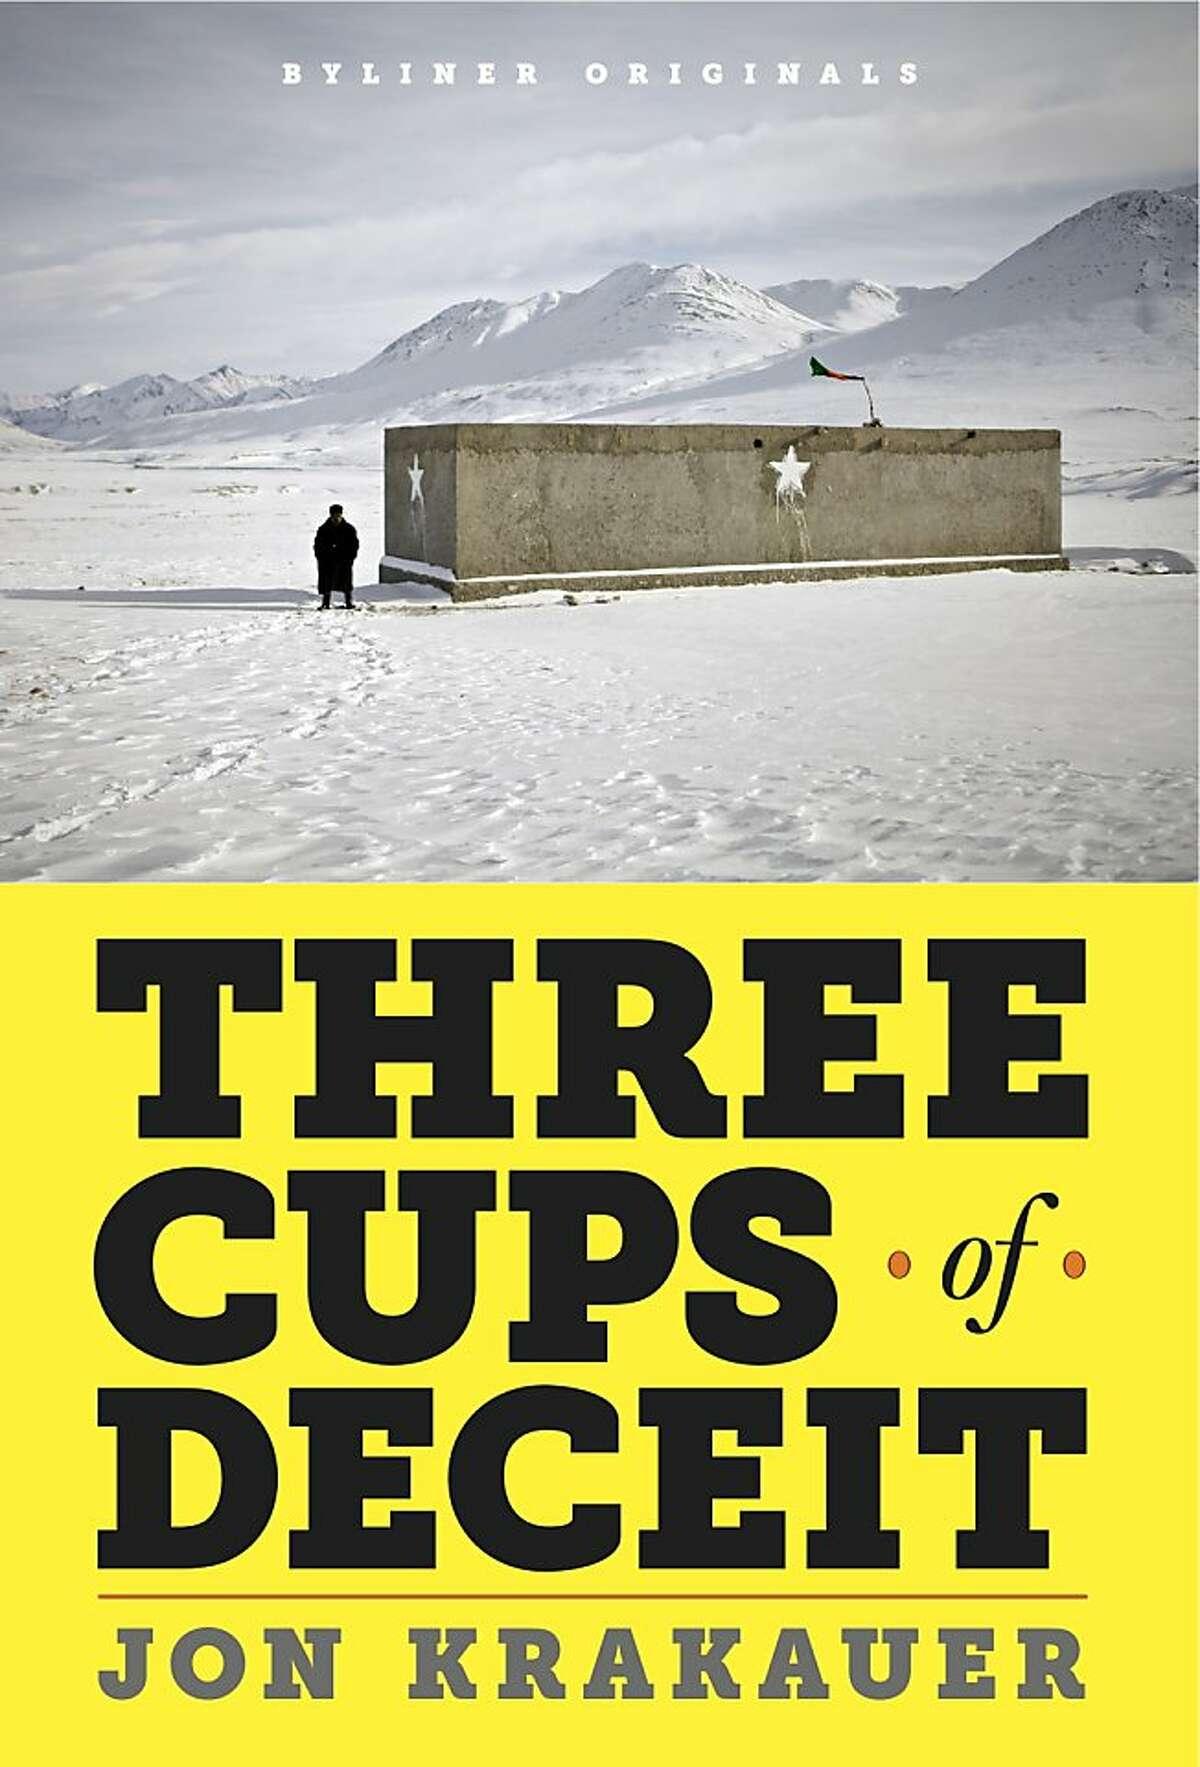 Three Cups of Deceit: How Greg Mortenson, Humanitarian Hero, Lost His Way by Jon Krakauer